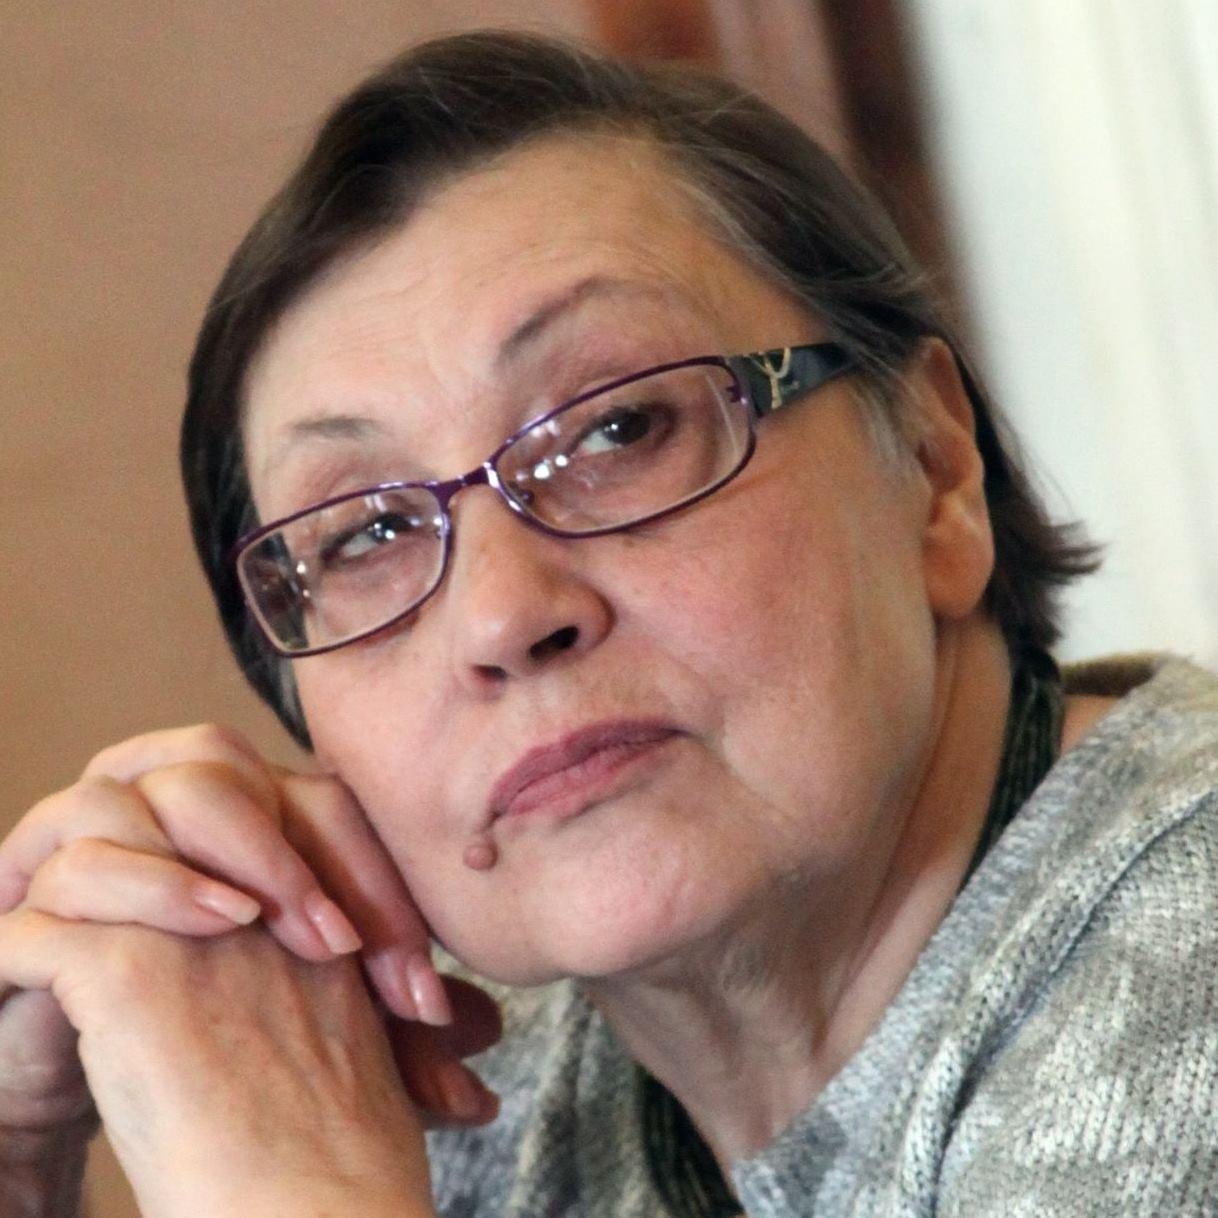 Людмила Сёмина